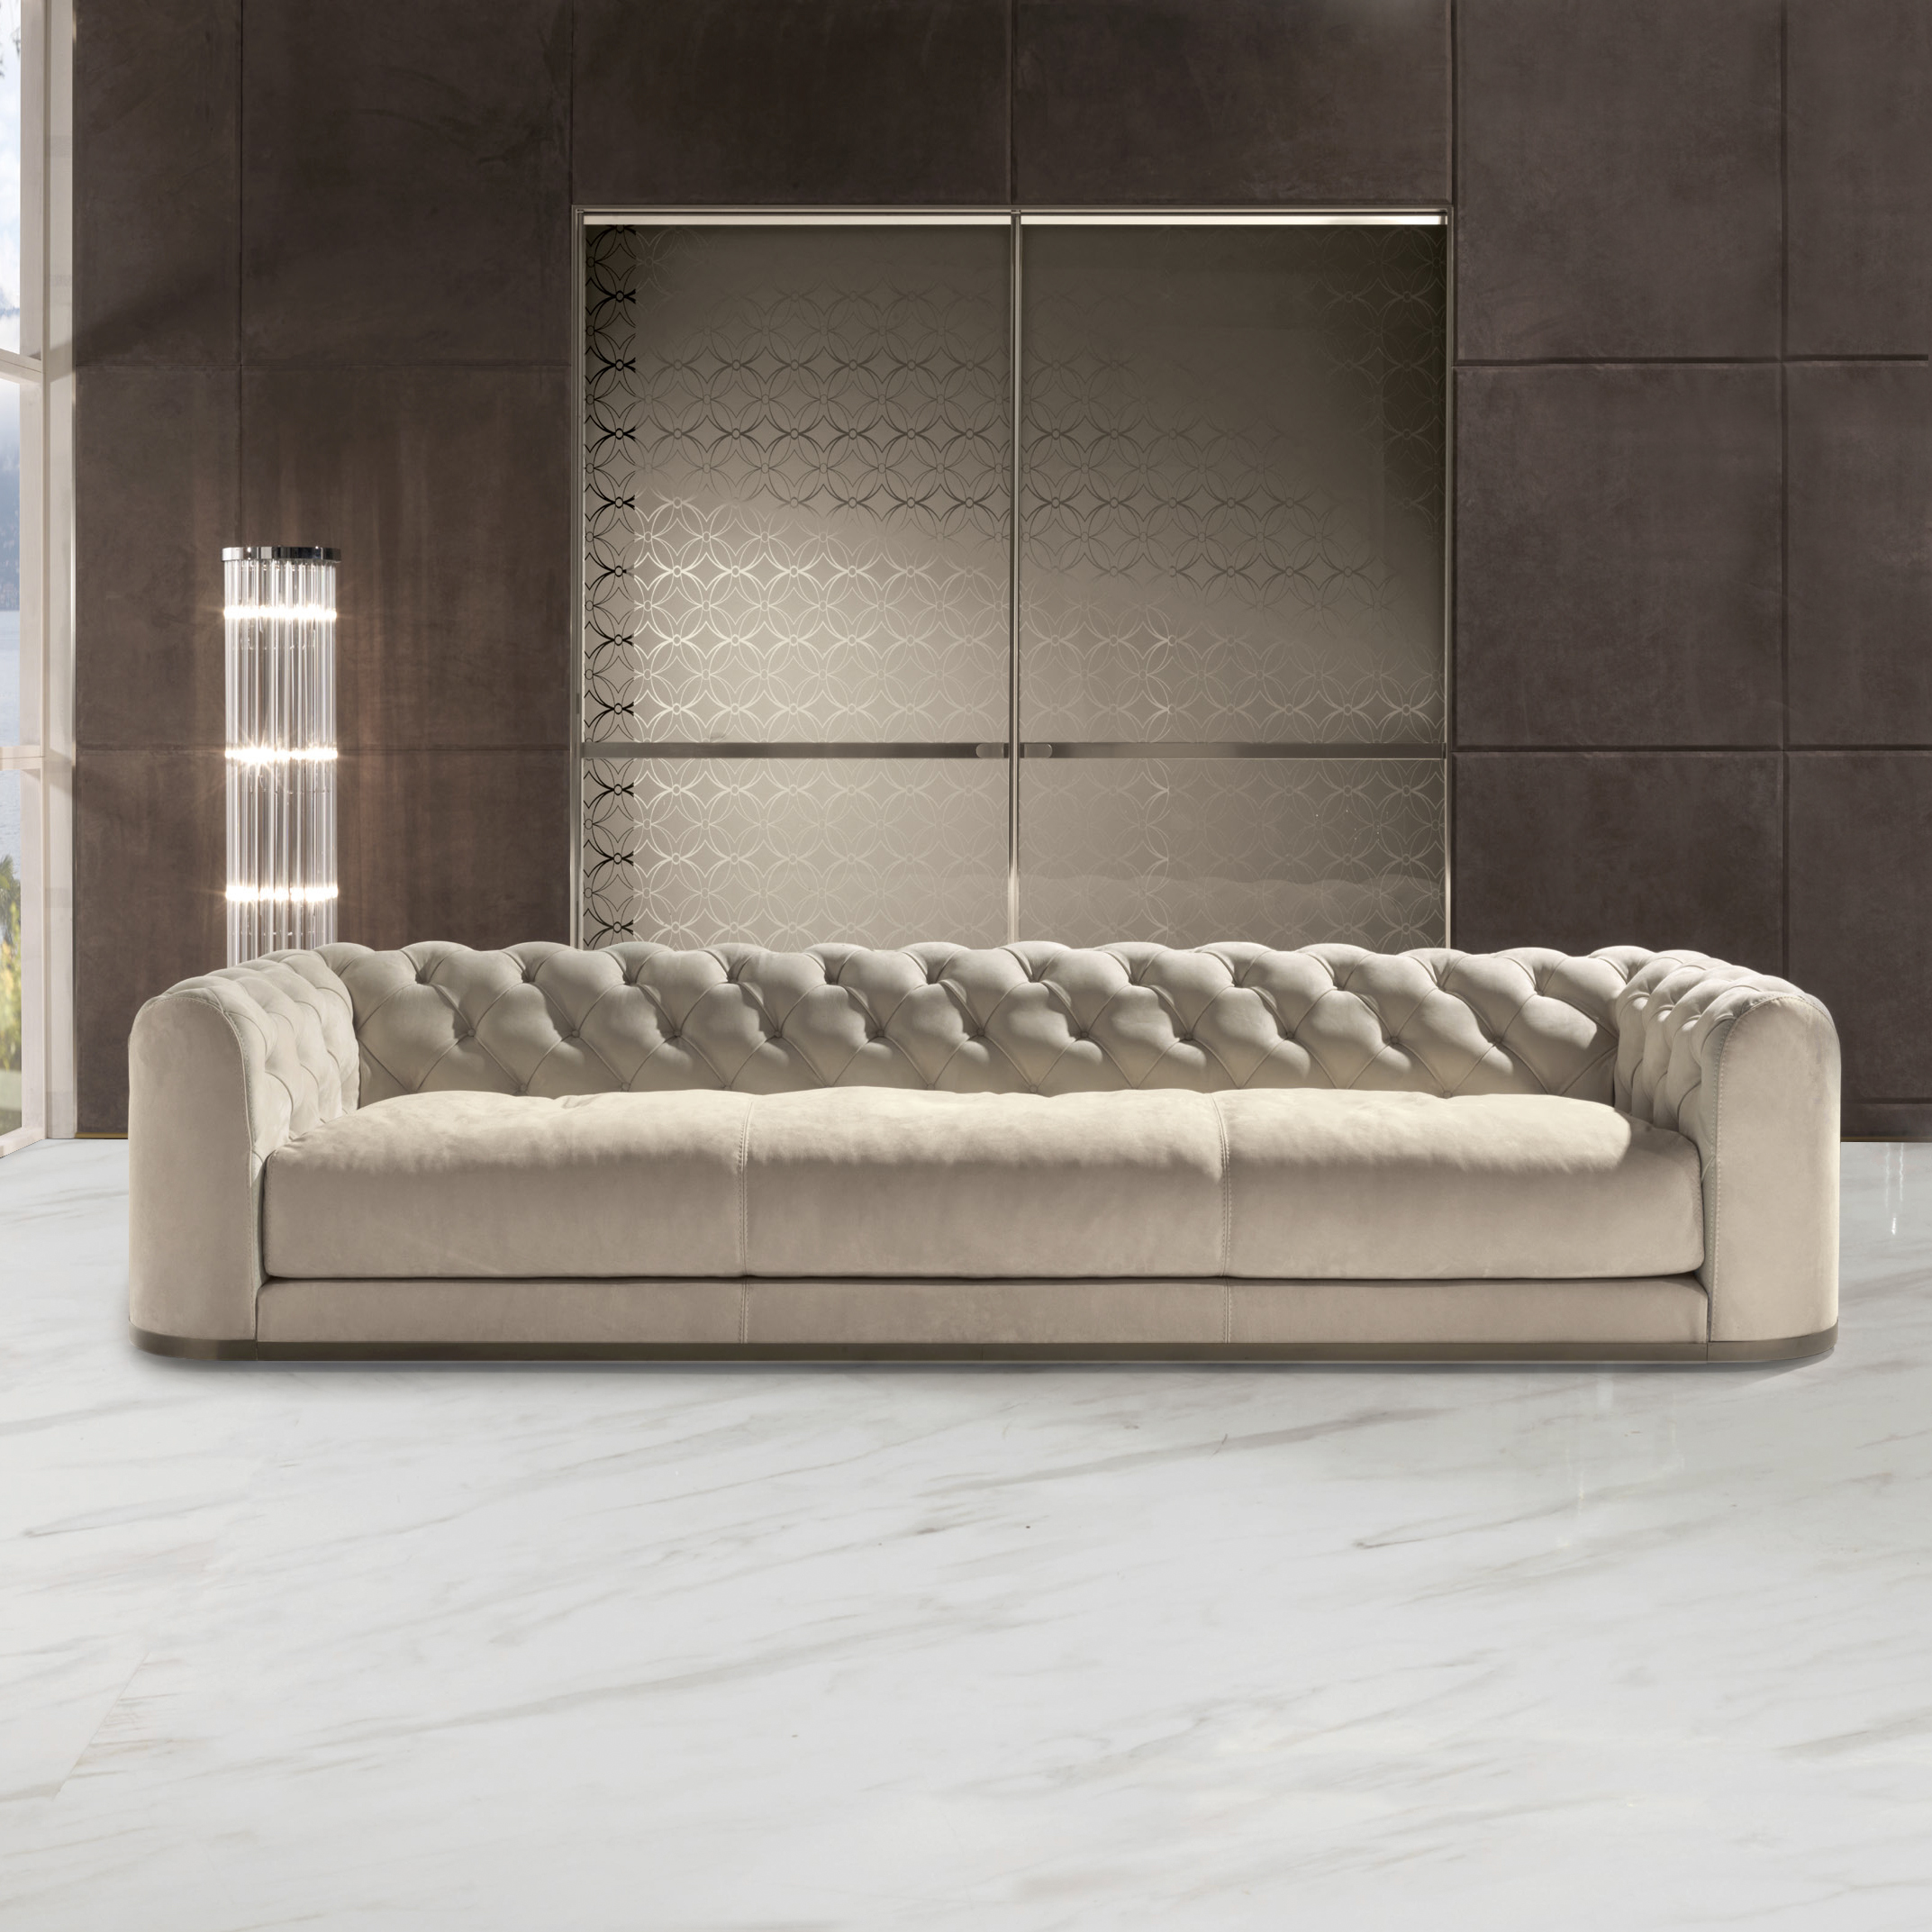 Charmant Milton Luxury Italian Sofa   Italian Designer U0026 Luxury Furniture At Cassoni